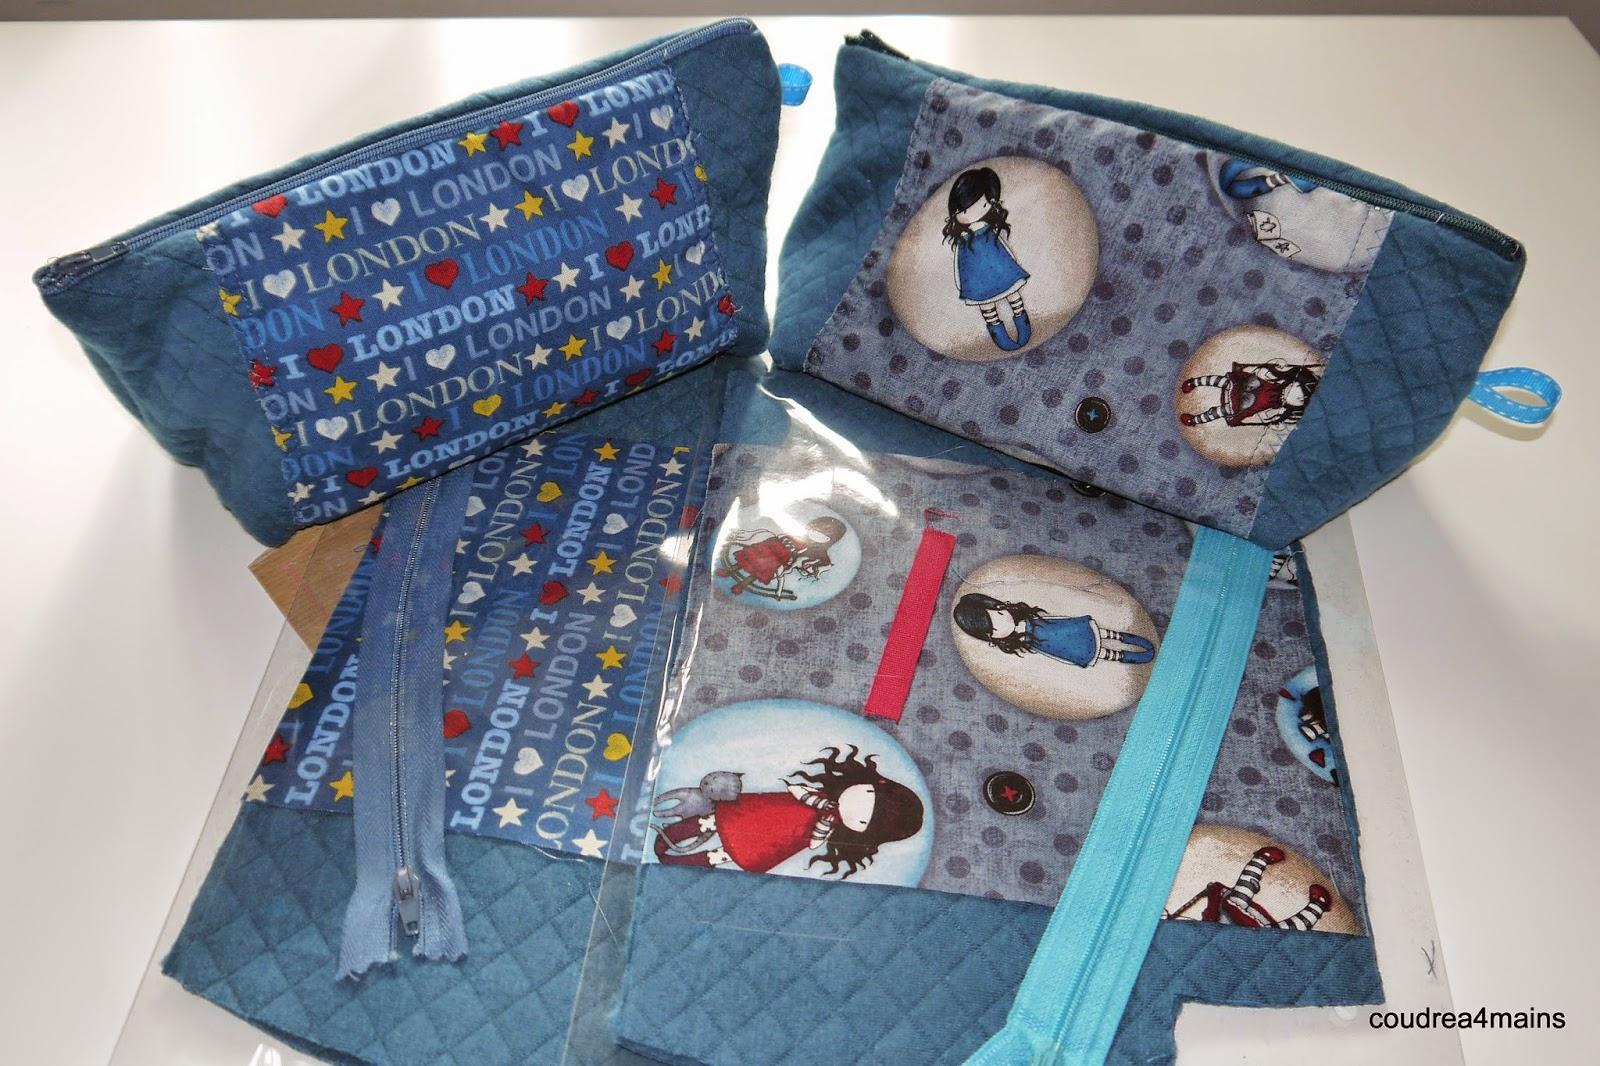 Coudre 4 mains nouveaux kits couture for Couture a 4 mains